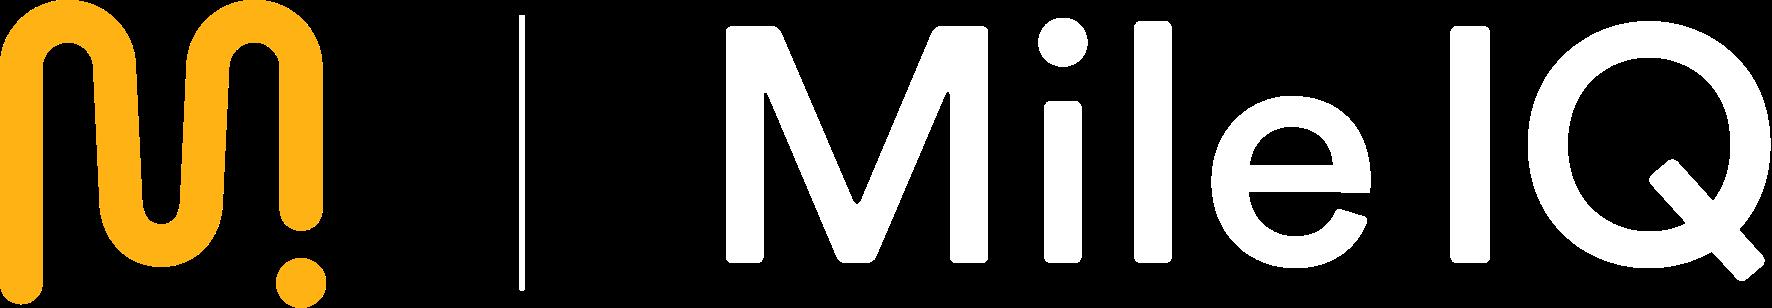 bYG8WzOdcwxhxPb3dPQbnA-MIQ_Logo_White.png